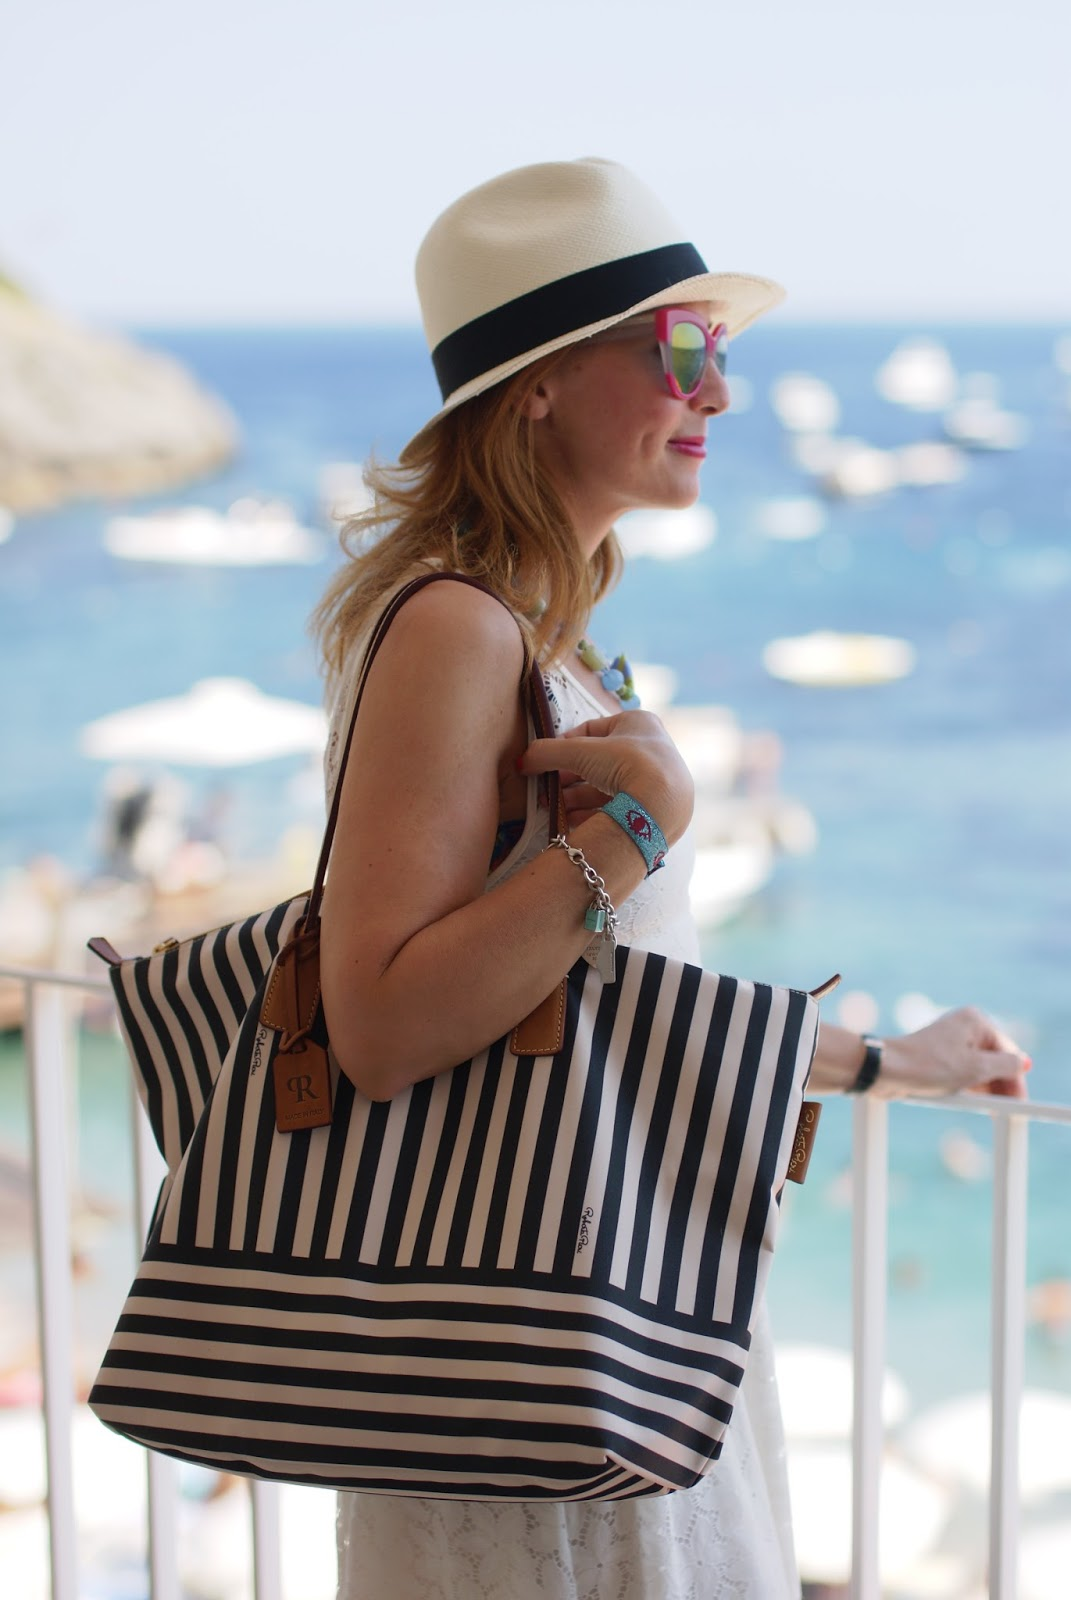 Amalfi coast look, what to wear on the Amalfi Coast,  holiday fashion, Ecua-Andino panama hat and Robertina bag on Fashion and Cookies fashion blog, fashion blogger style